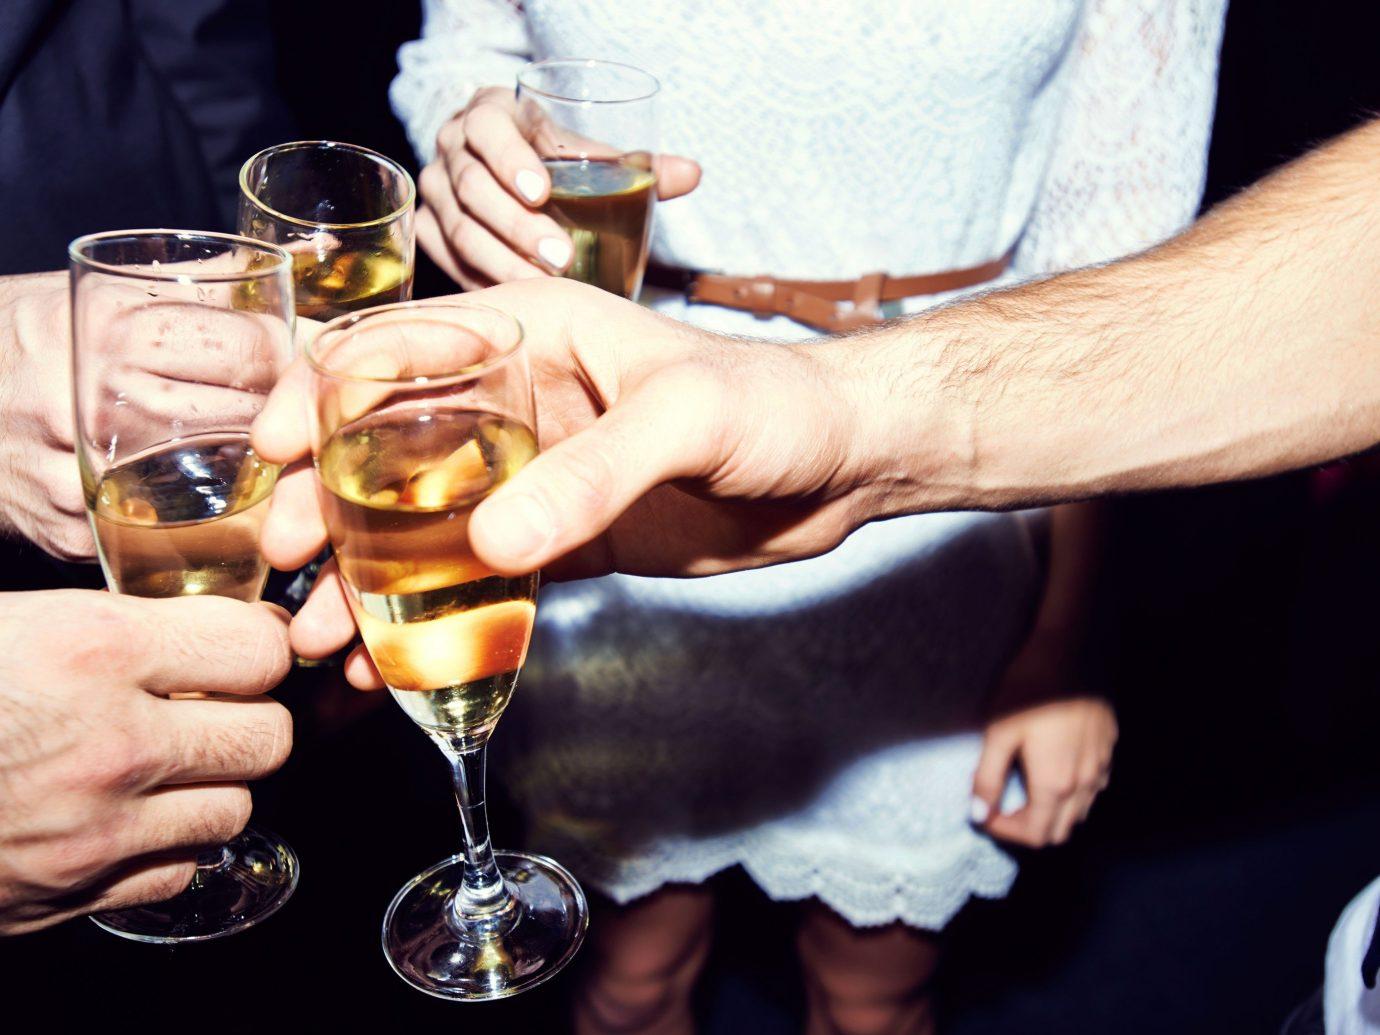 Offbeat person wine table glasses alcoholic beverage alcohol Drink wine glass hand sense glass stemware